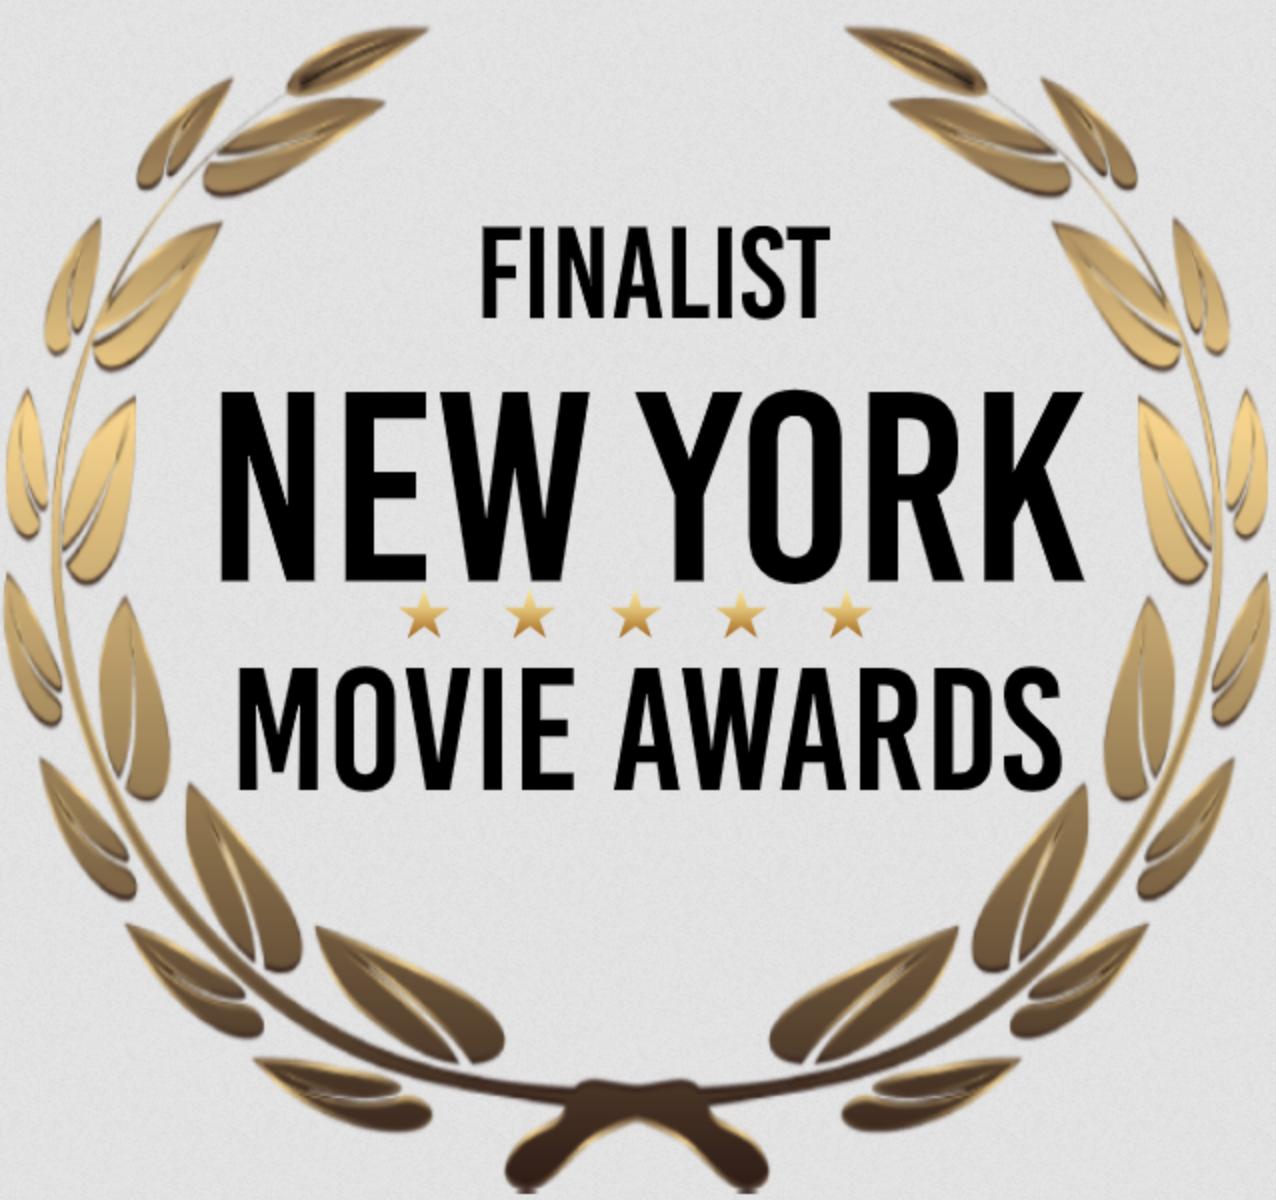 NYMA Finalist